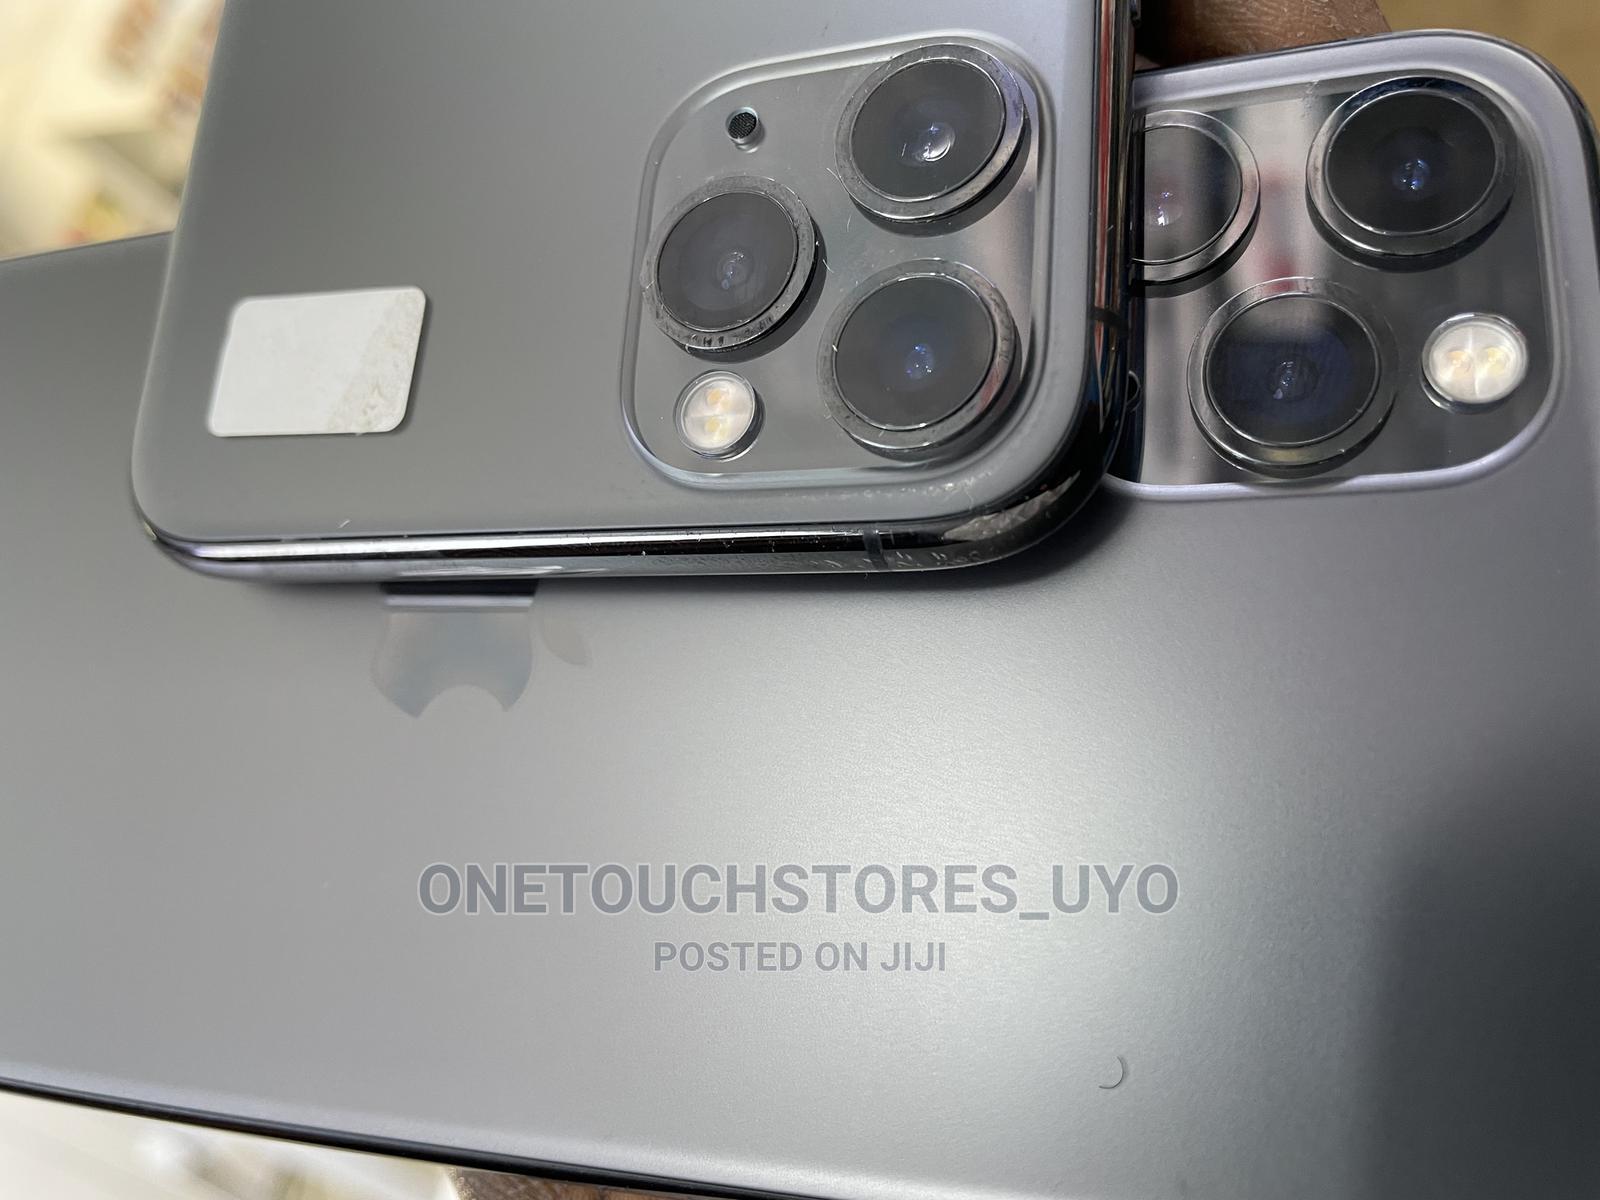 Apple iPhone 11 Pro Max 64 GB Gray | Mobile Phones for sale in Uyo, Akwa Ibom State, Nigeria